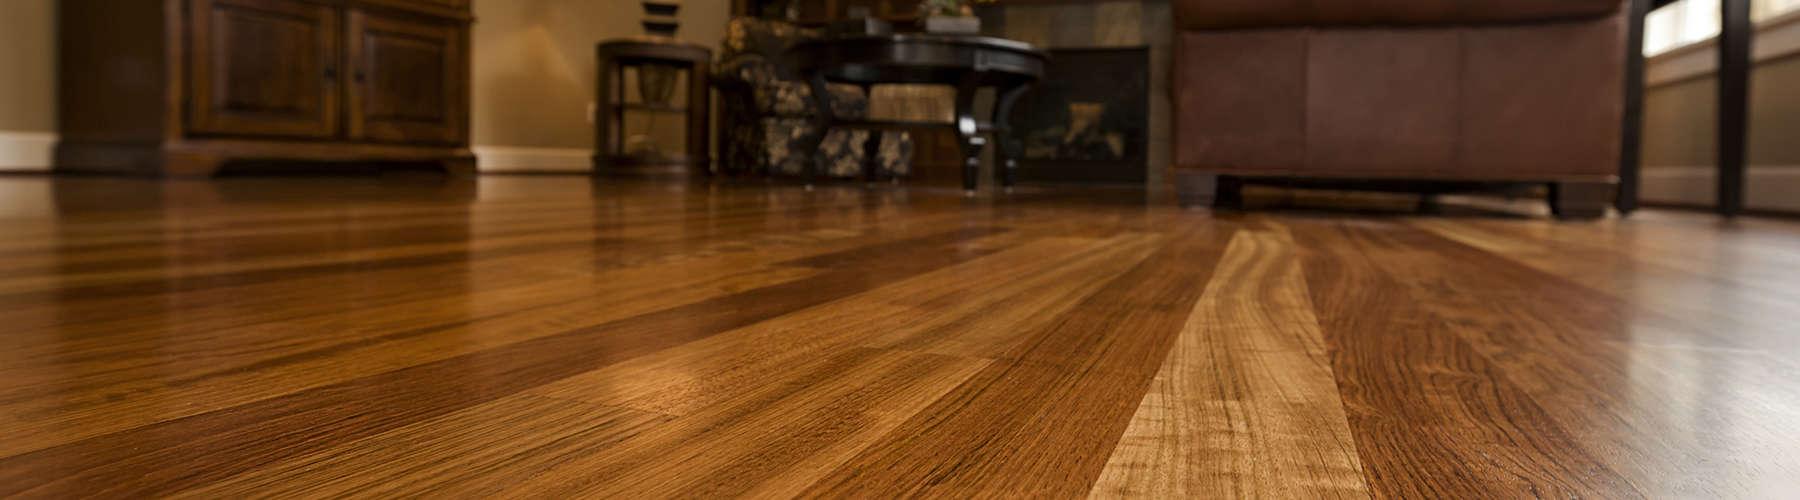 Beautiful New Hardwood floors home interior